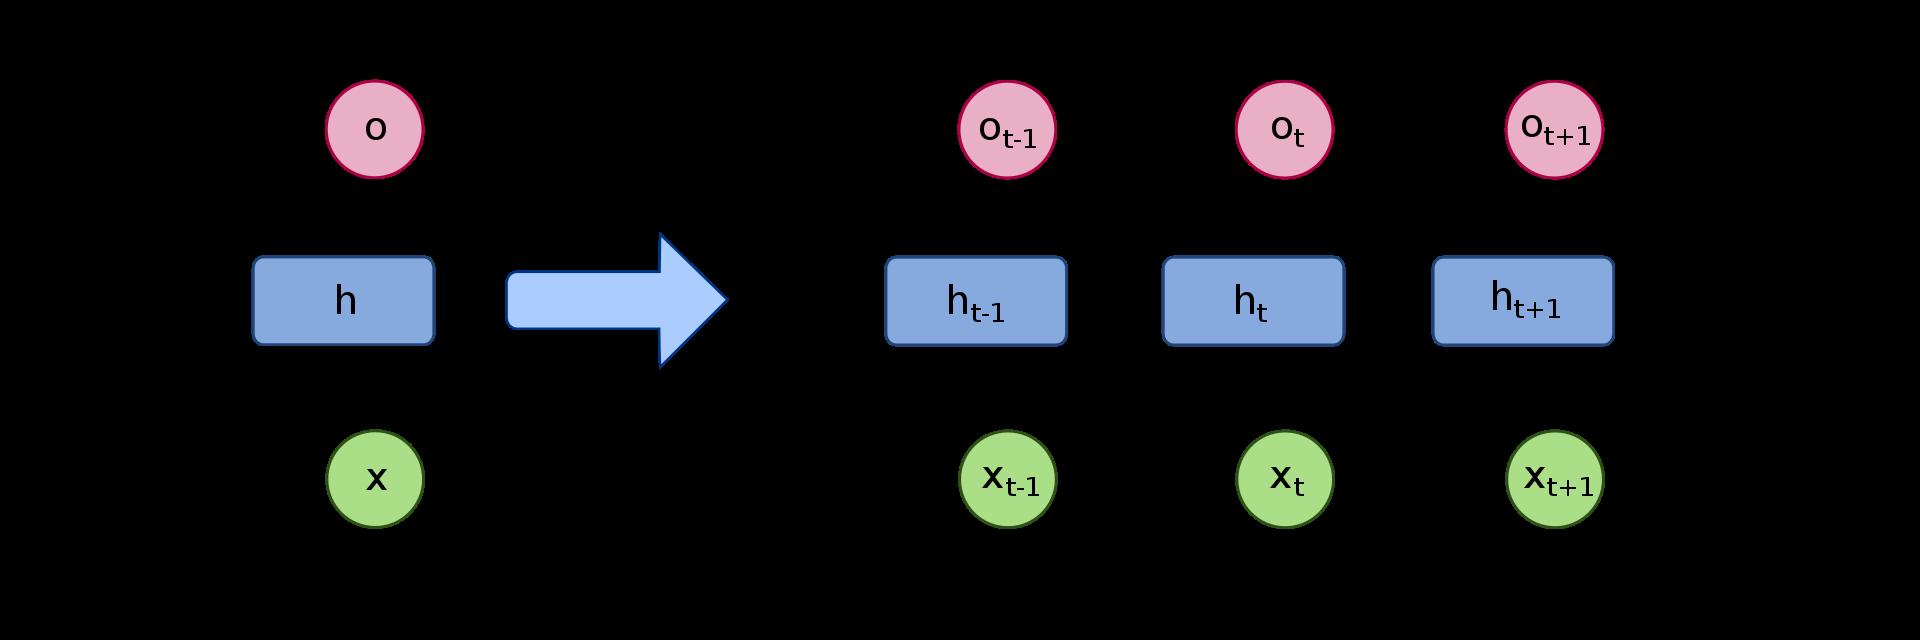 Convolutional Recurrent Neural Networks